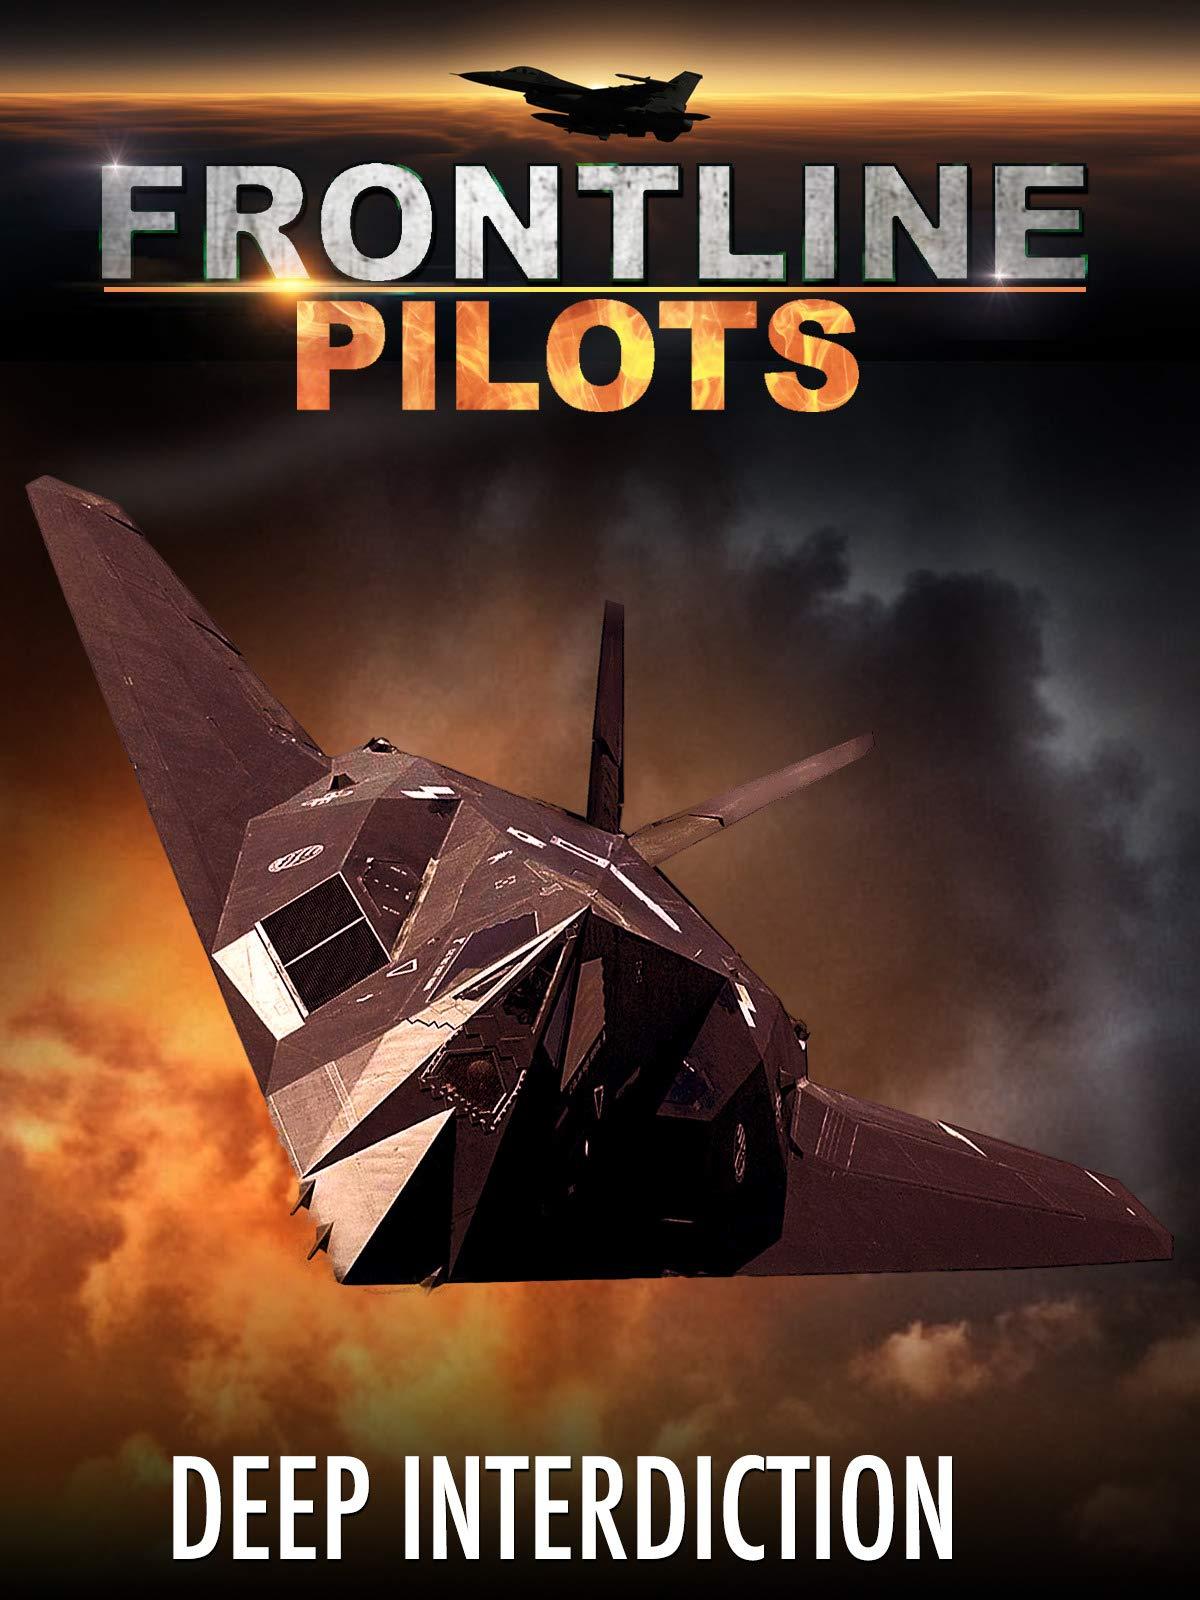 Frontline Pilots -  Deep Interdiction on Amazon Prime Video UK